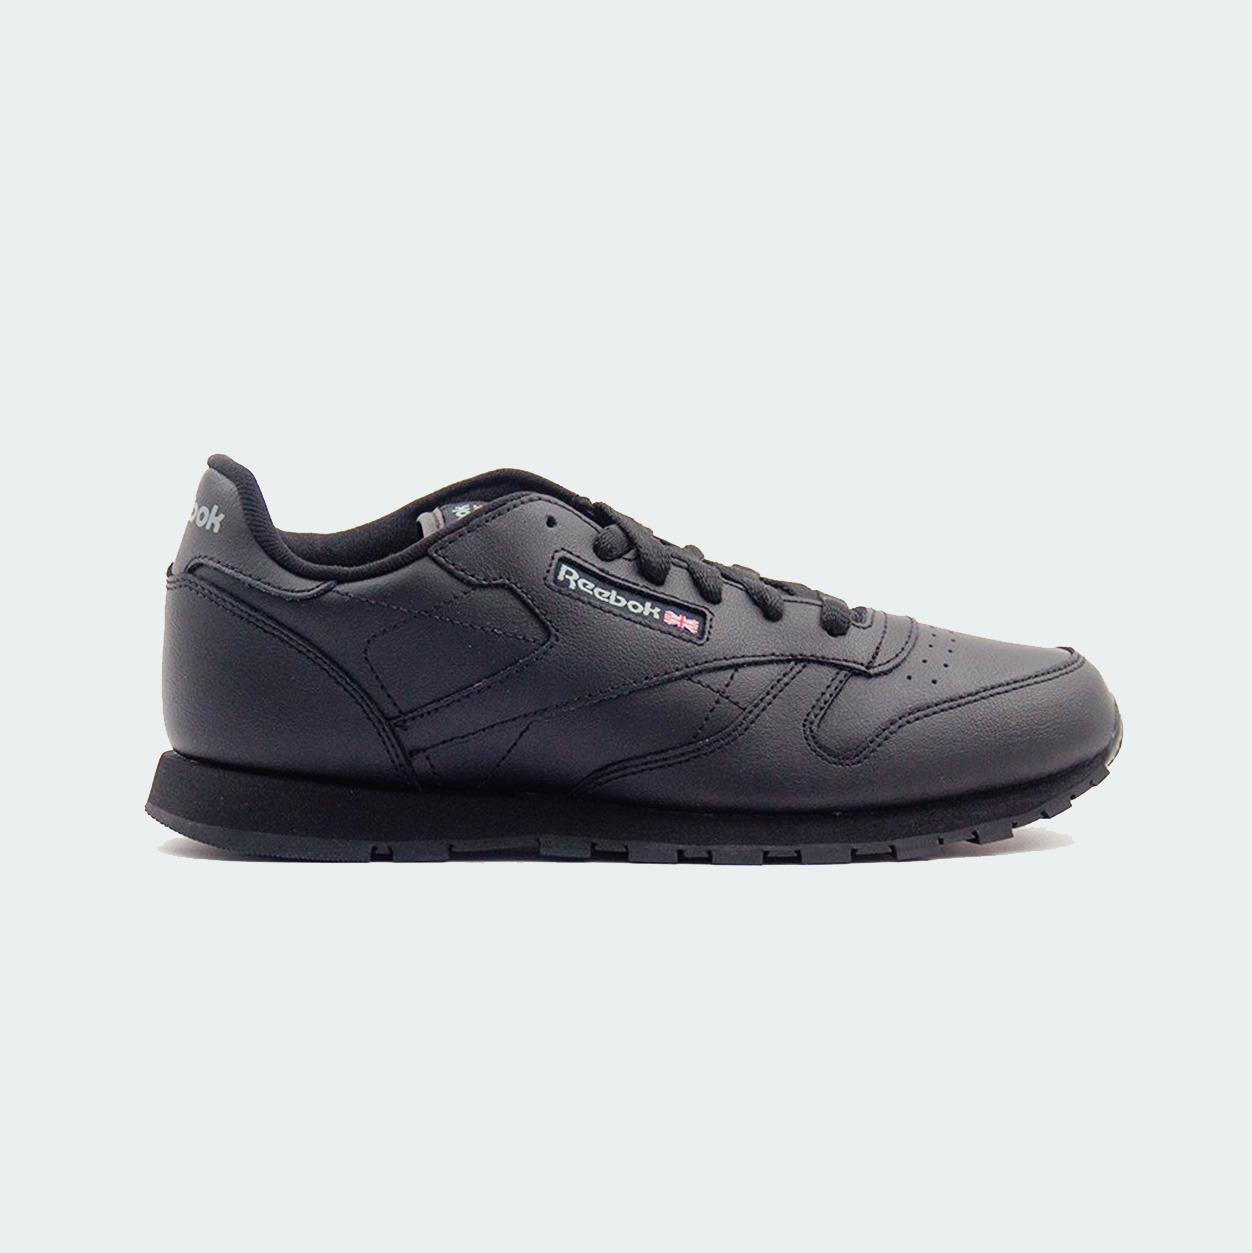 Tenis Reebok Classic Leather